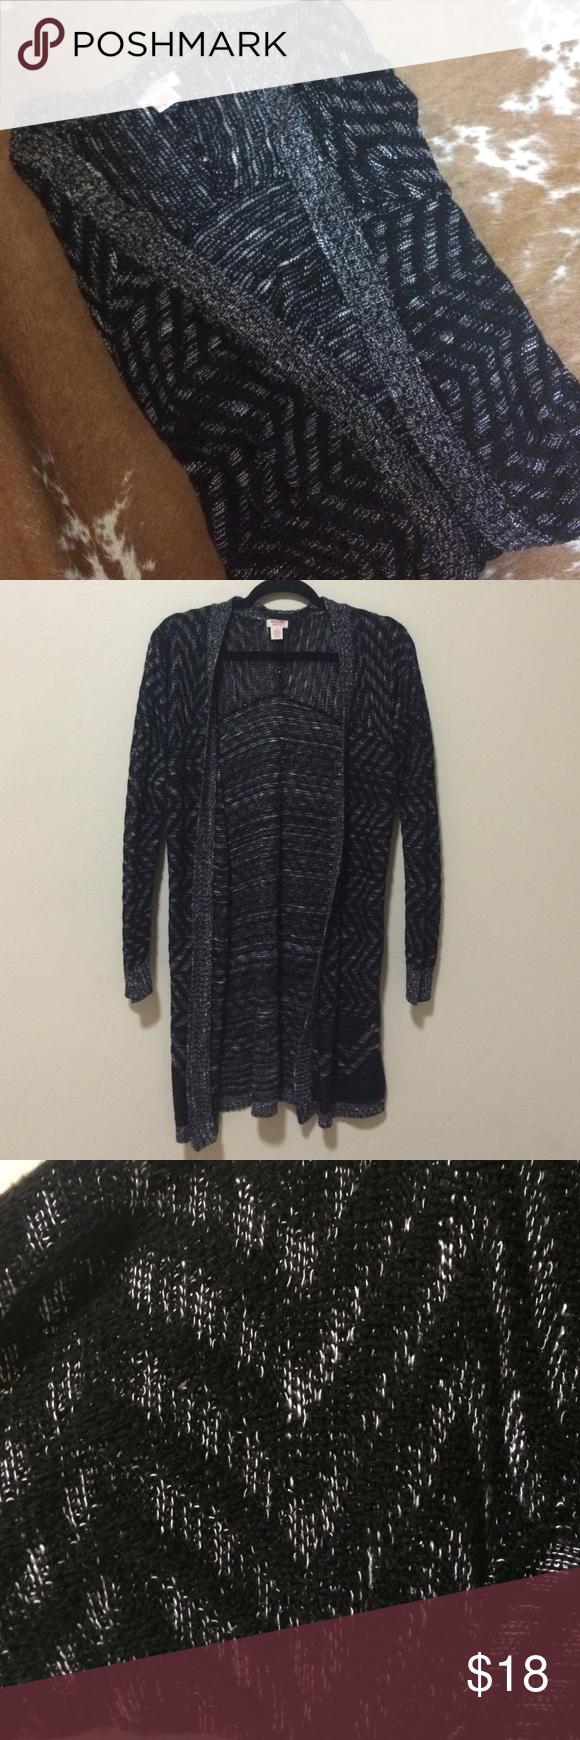 🔮Black Sweater Cardigan🔮 Super soft black long cardi from Target ...